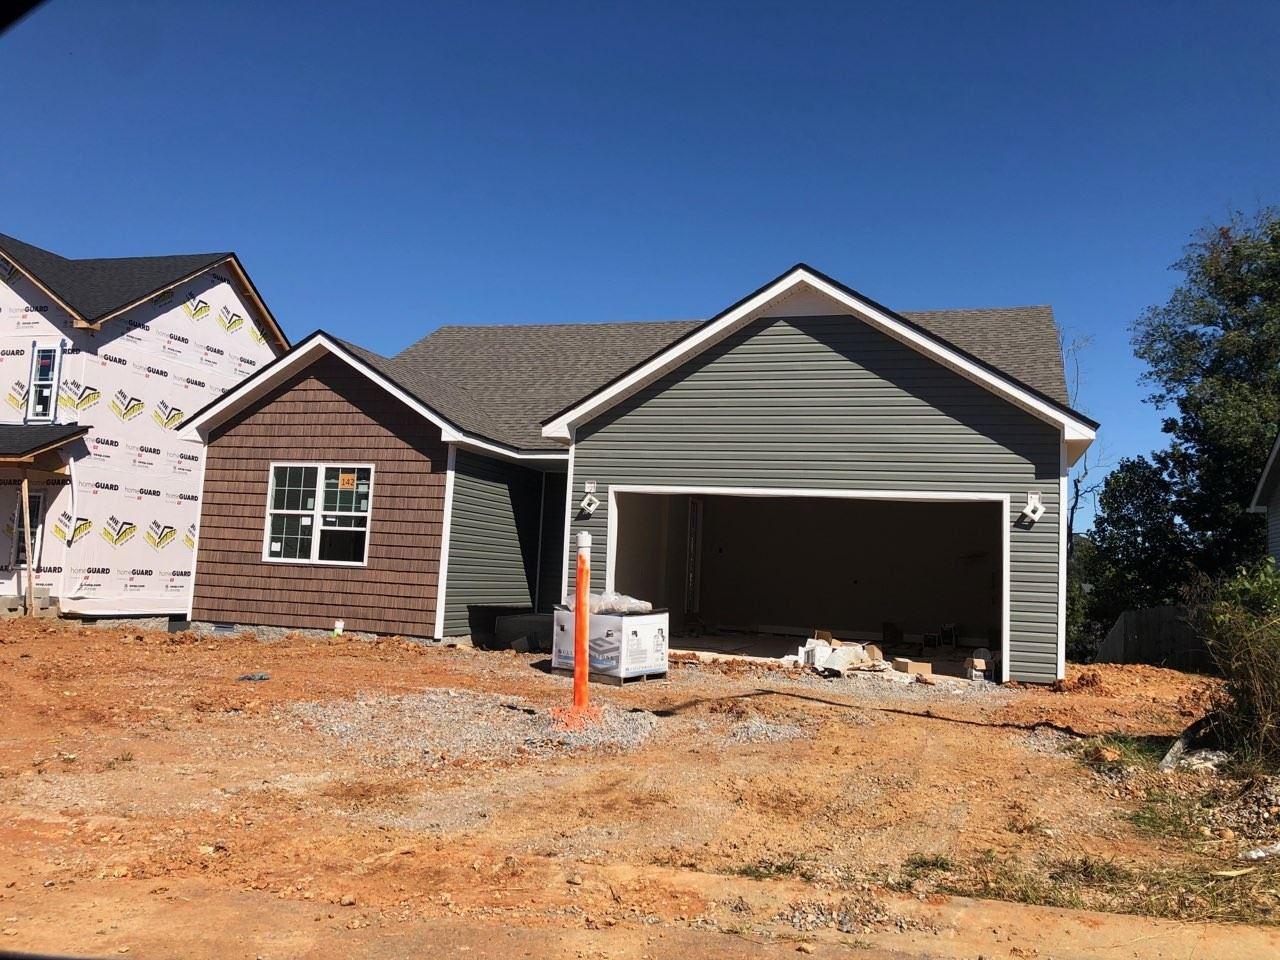 142 Camelot Hills, Clarksville, TN 37040 - MLS#: 2188616